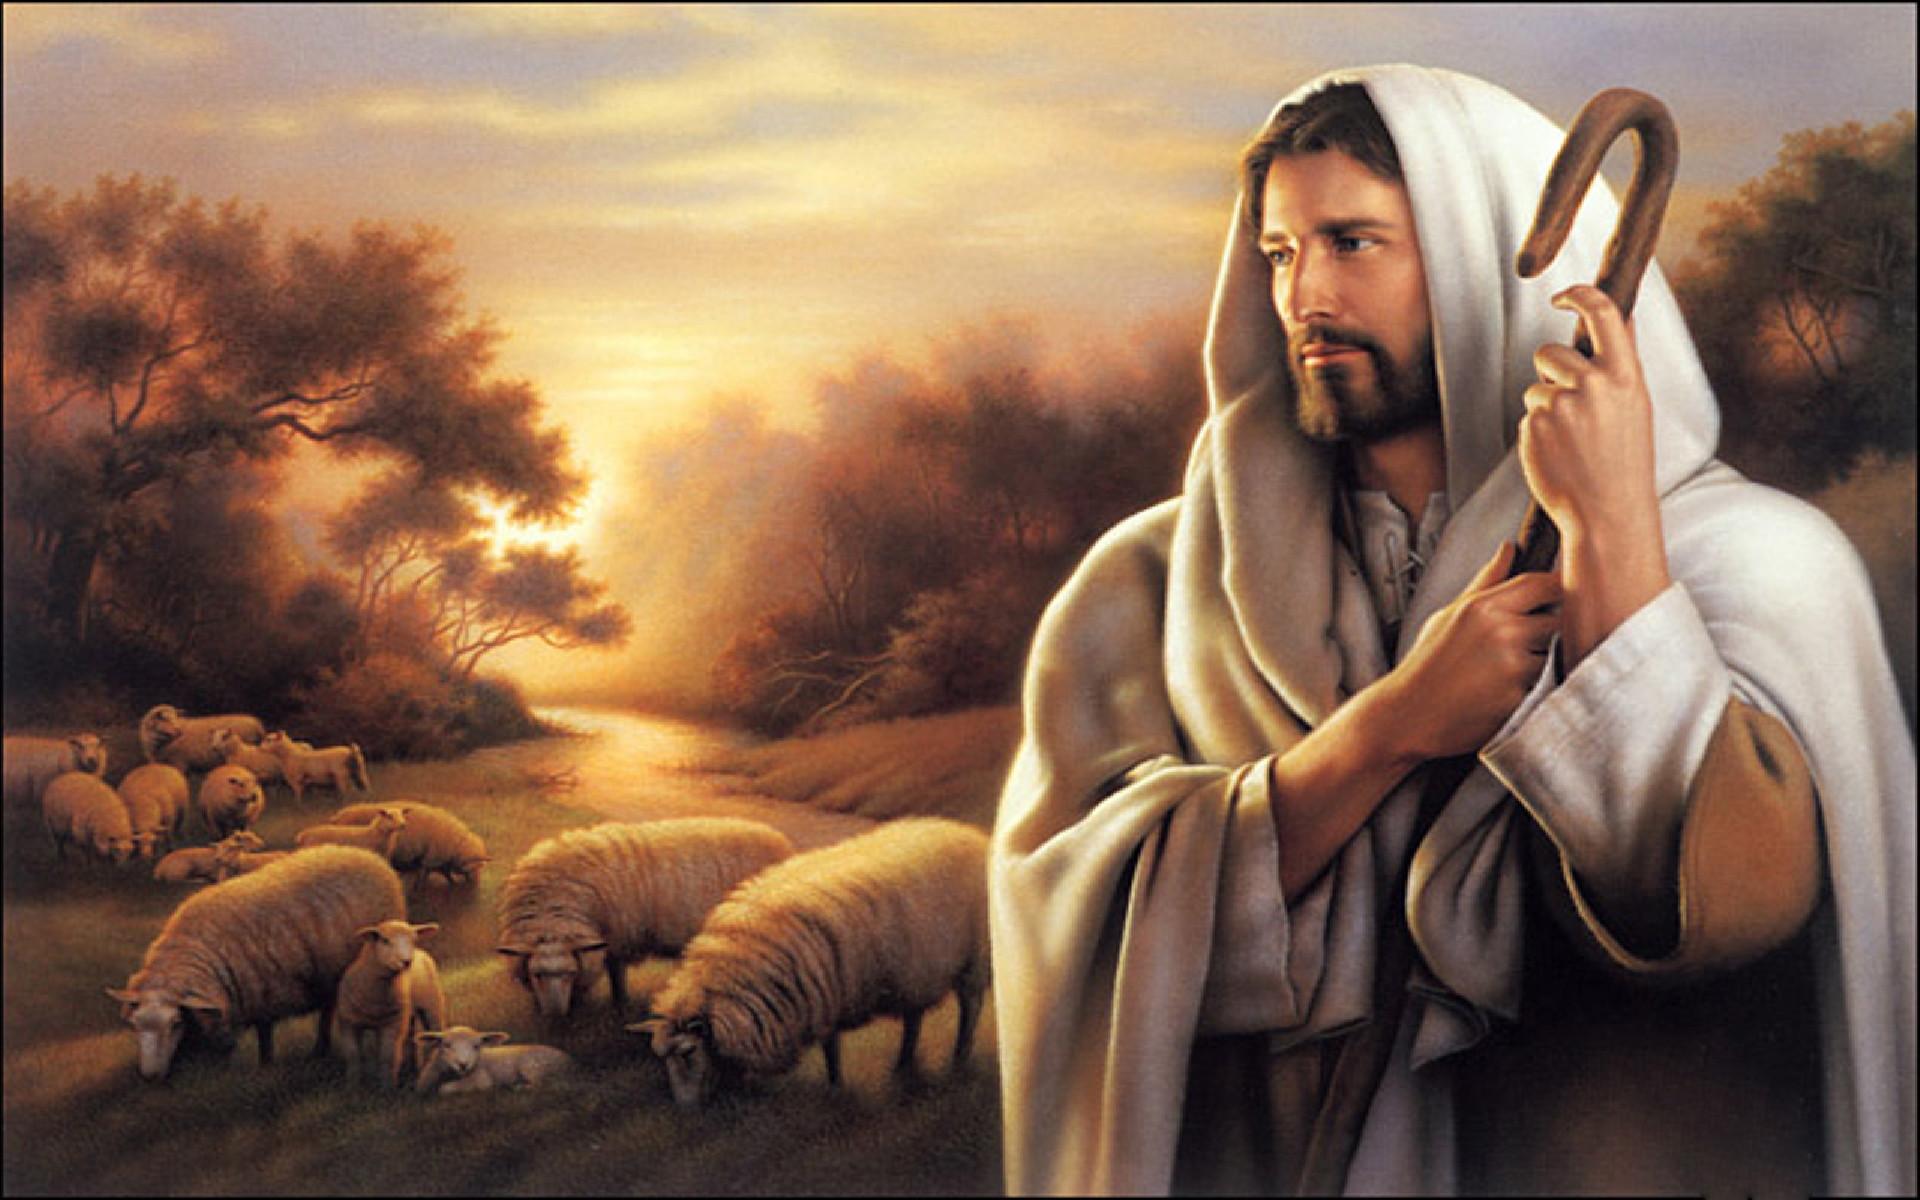 Wallpaper Jesus Christ 64 Images